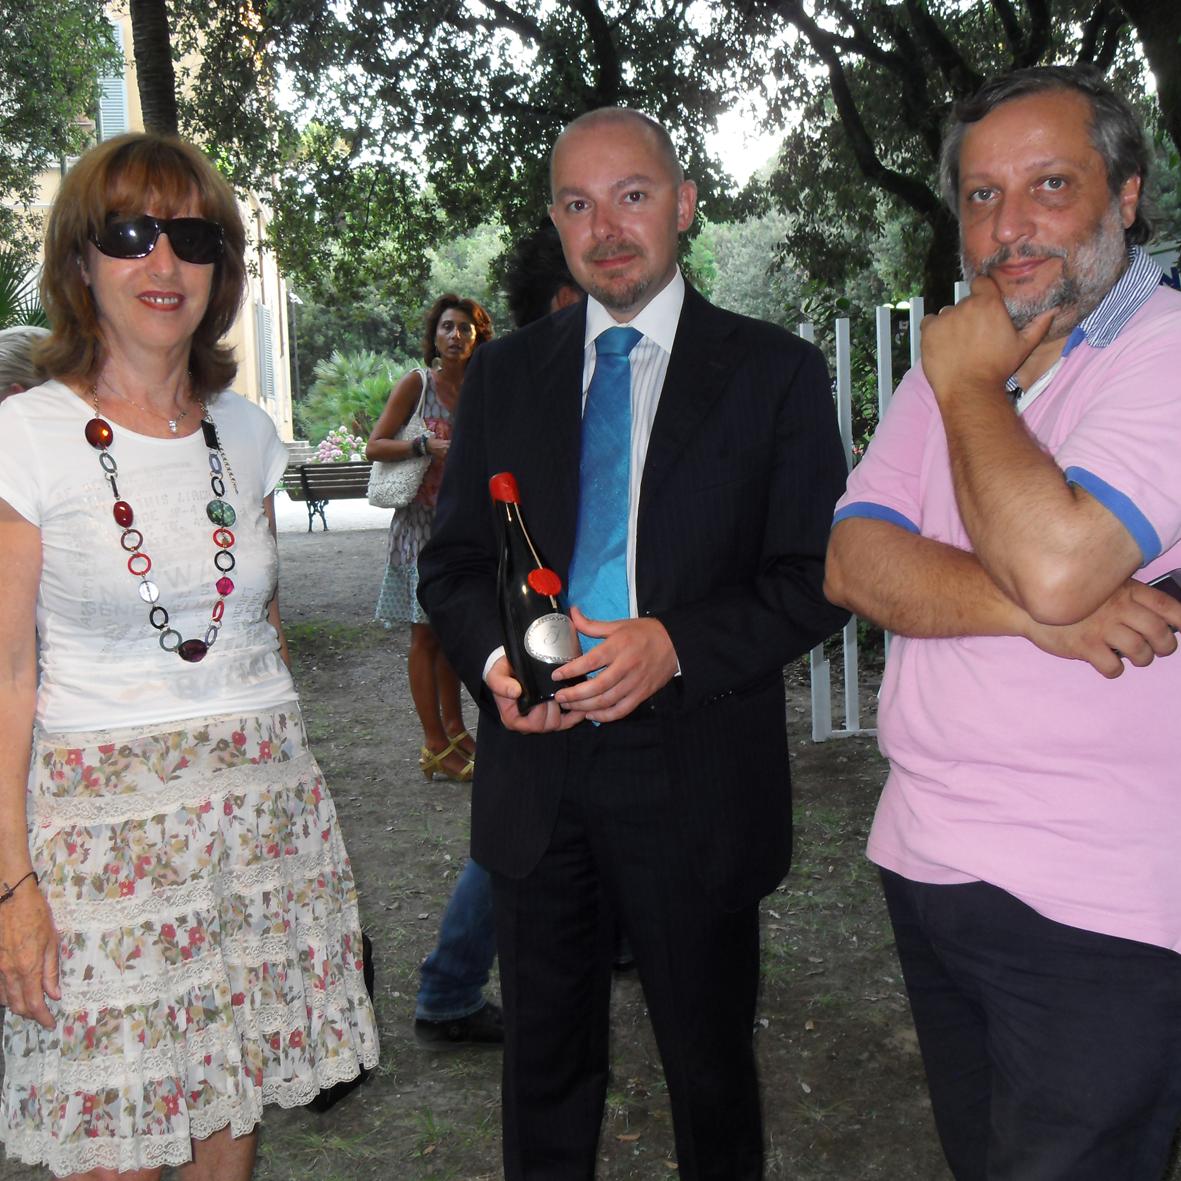 Vip Area La Versiliana Festival